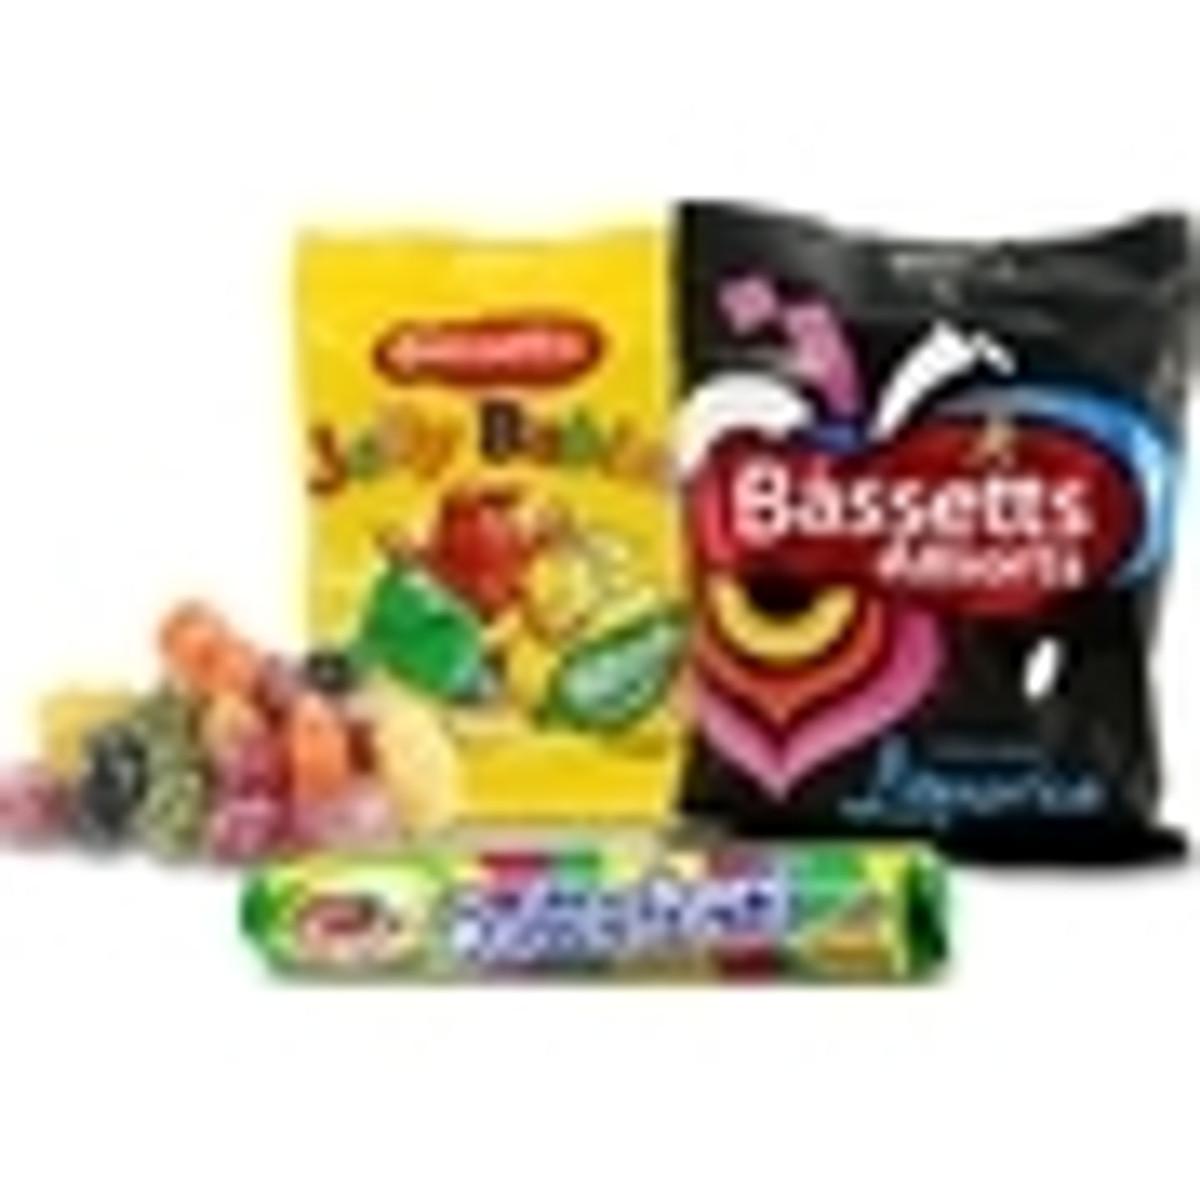 Maynards Bassetts Candy